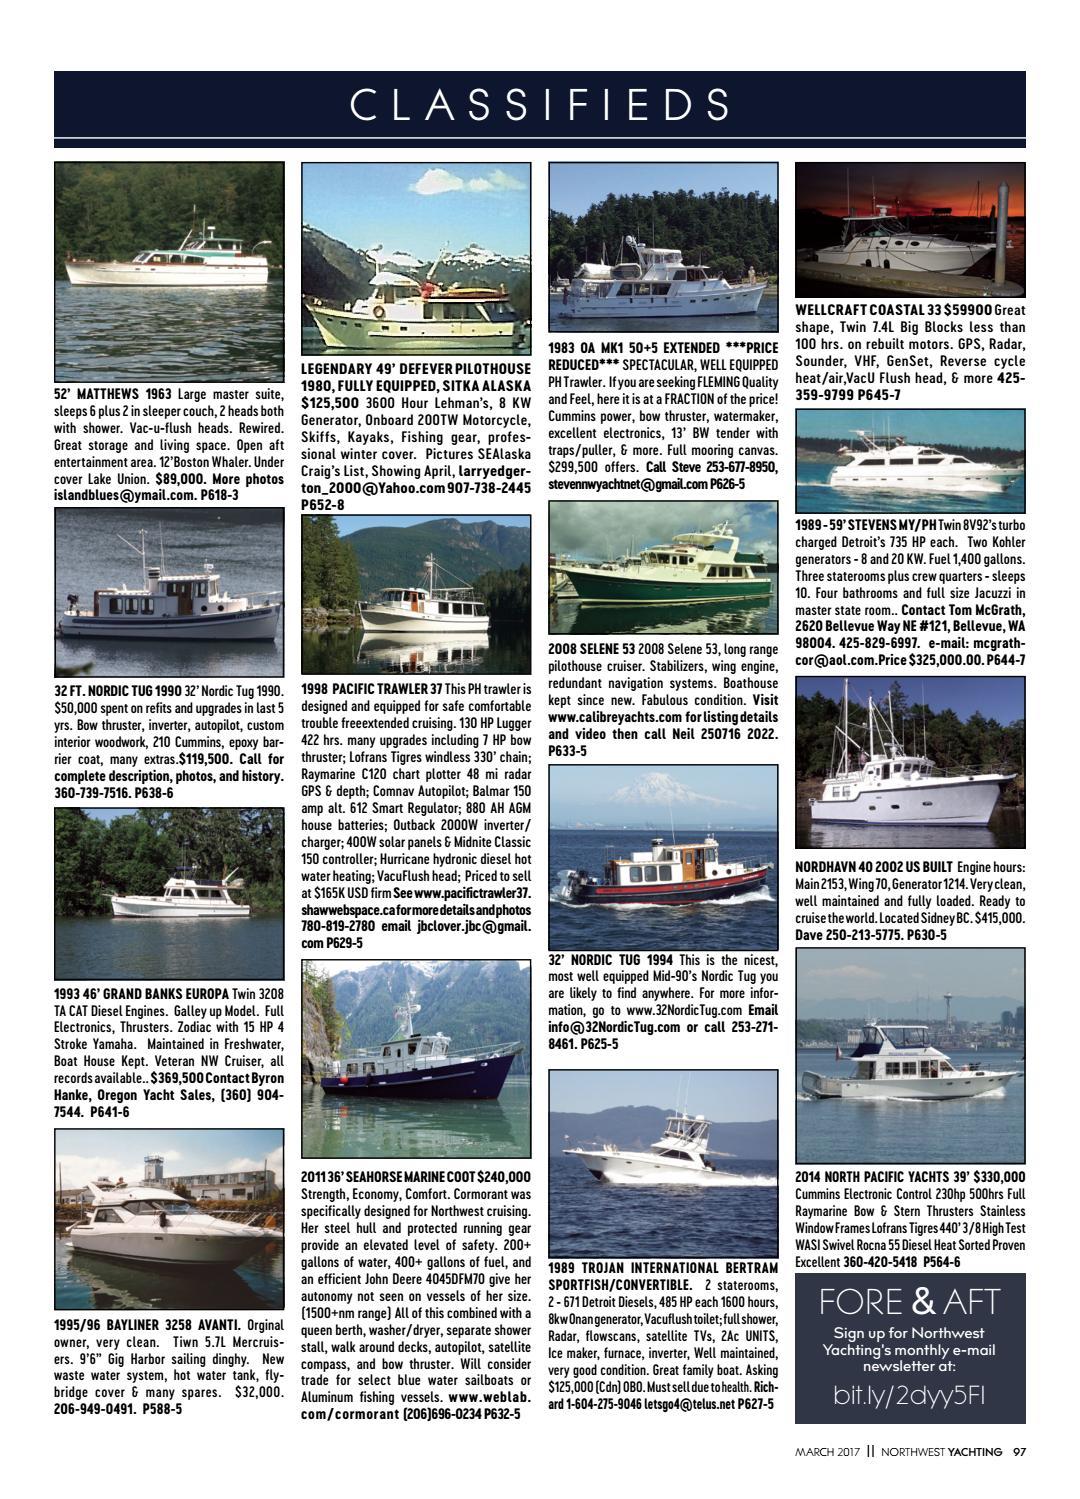 Phenomenal Northwest Yachting March 2017 By Northwest Yachting Issuu Creativecarmelina Interior Chair Design Creativecarmelinacom